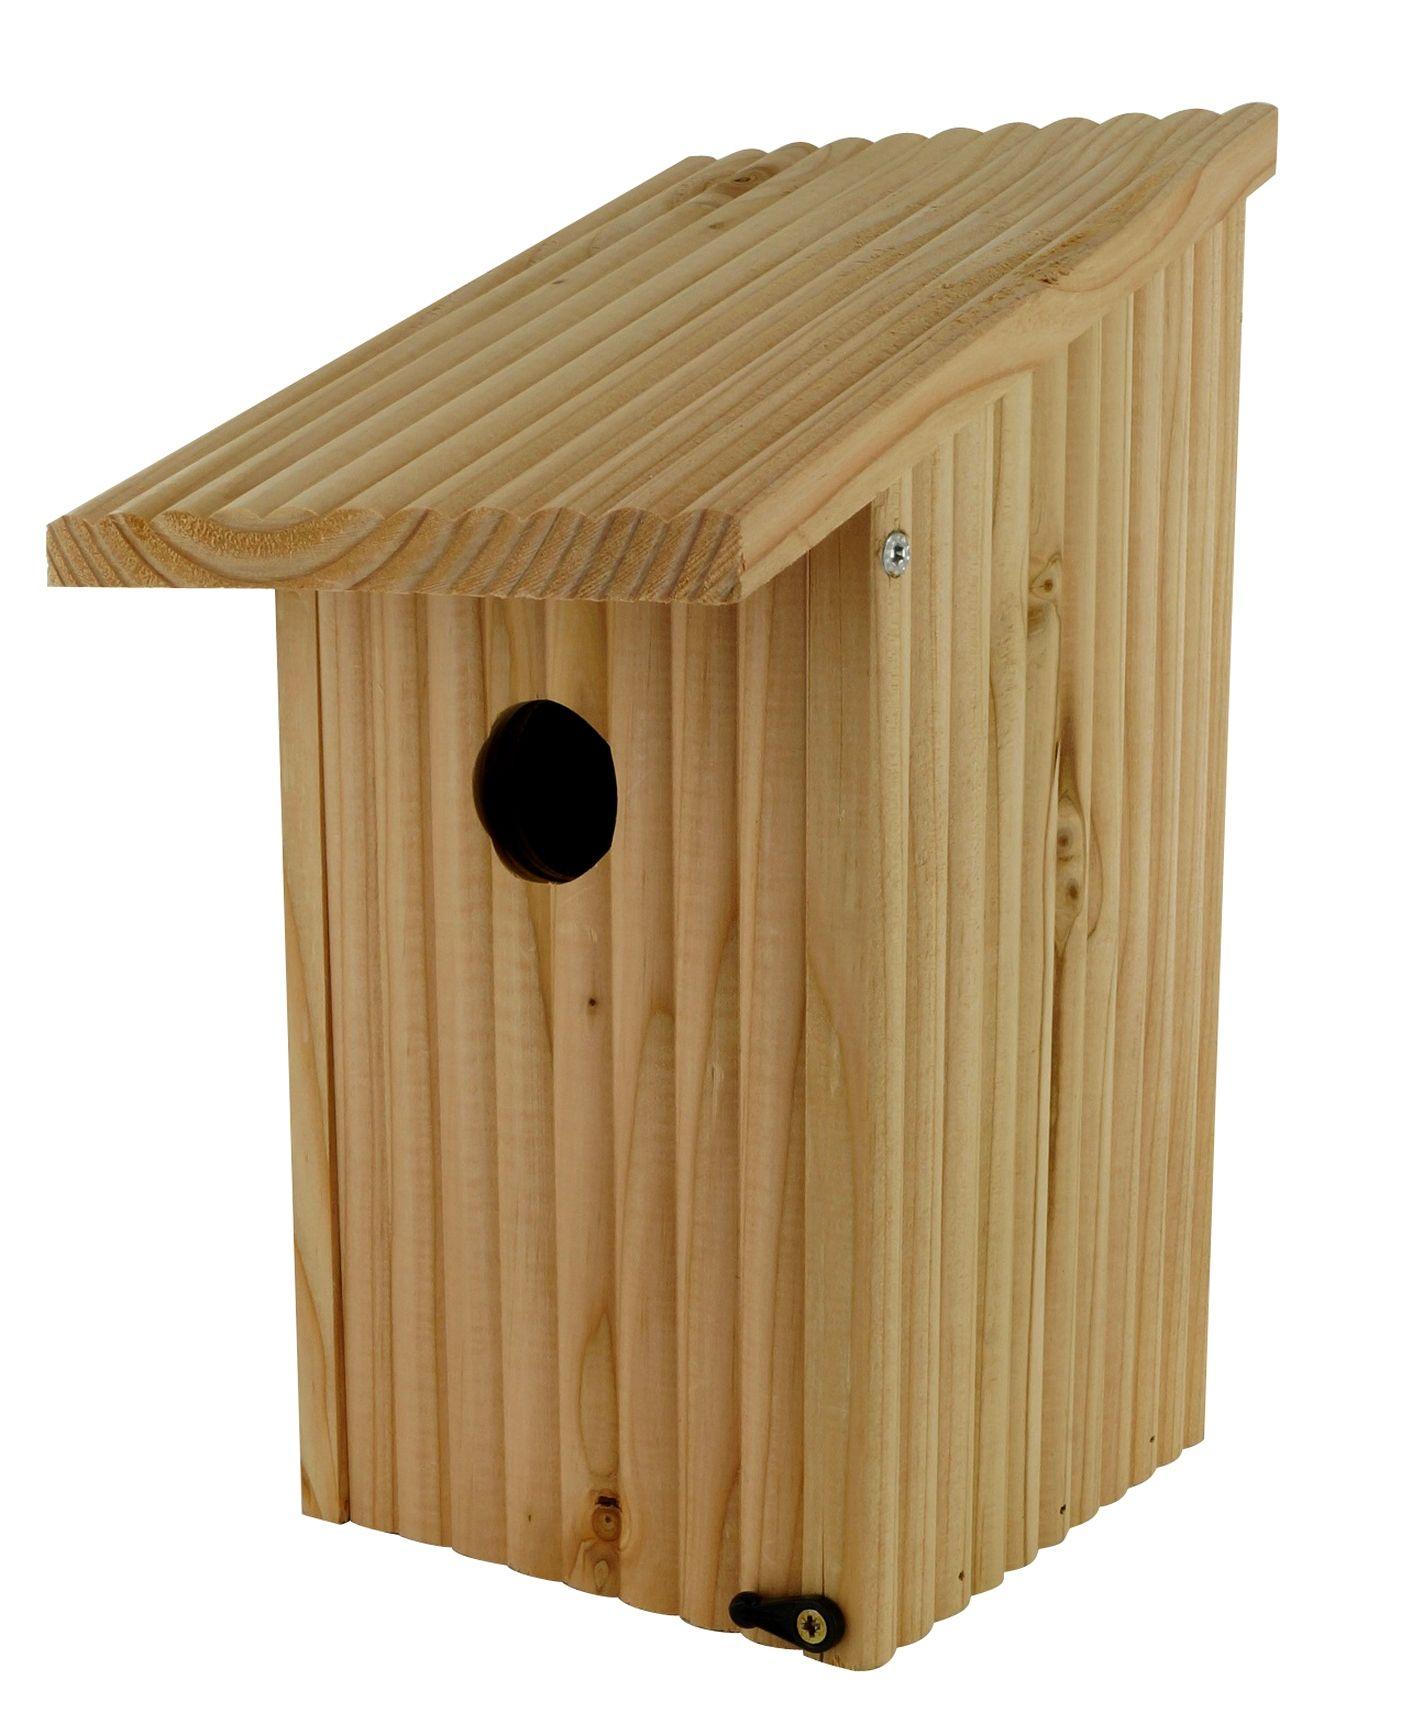 Nido per Cinciallegra in legno naturale puoi vederlo su floradecor.it  in Nidi + Casette per uccelli #birdhouses #birdgarden #nestboxes #wildlifegarden